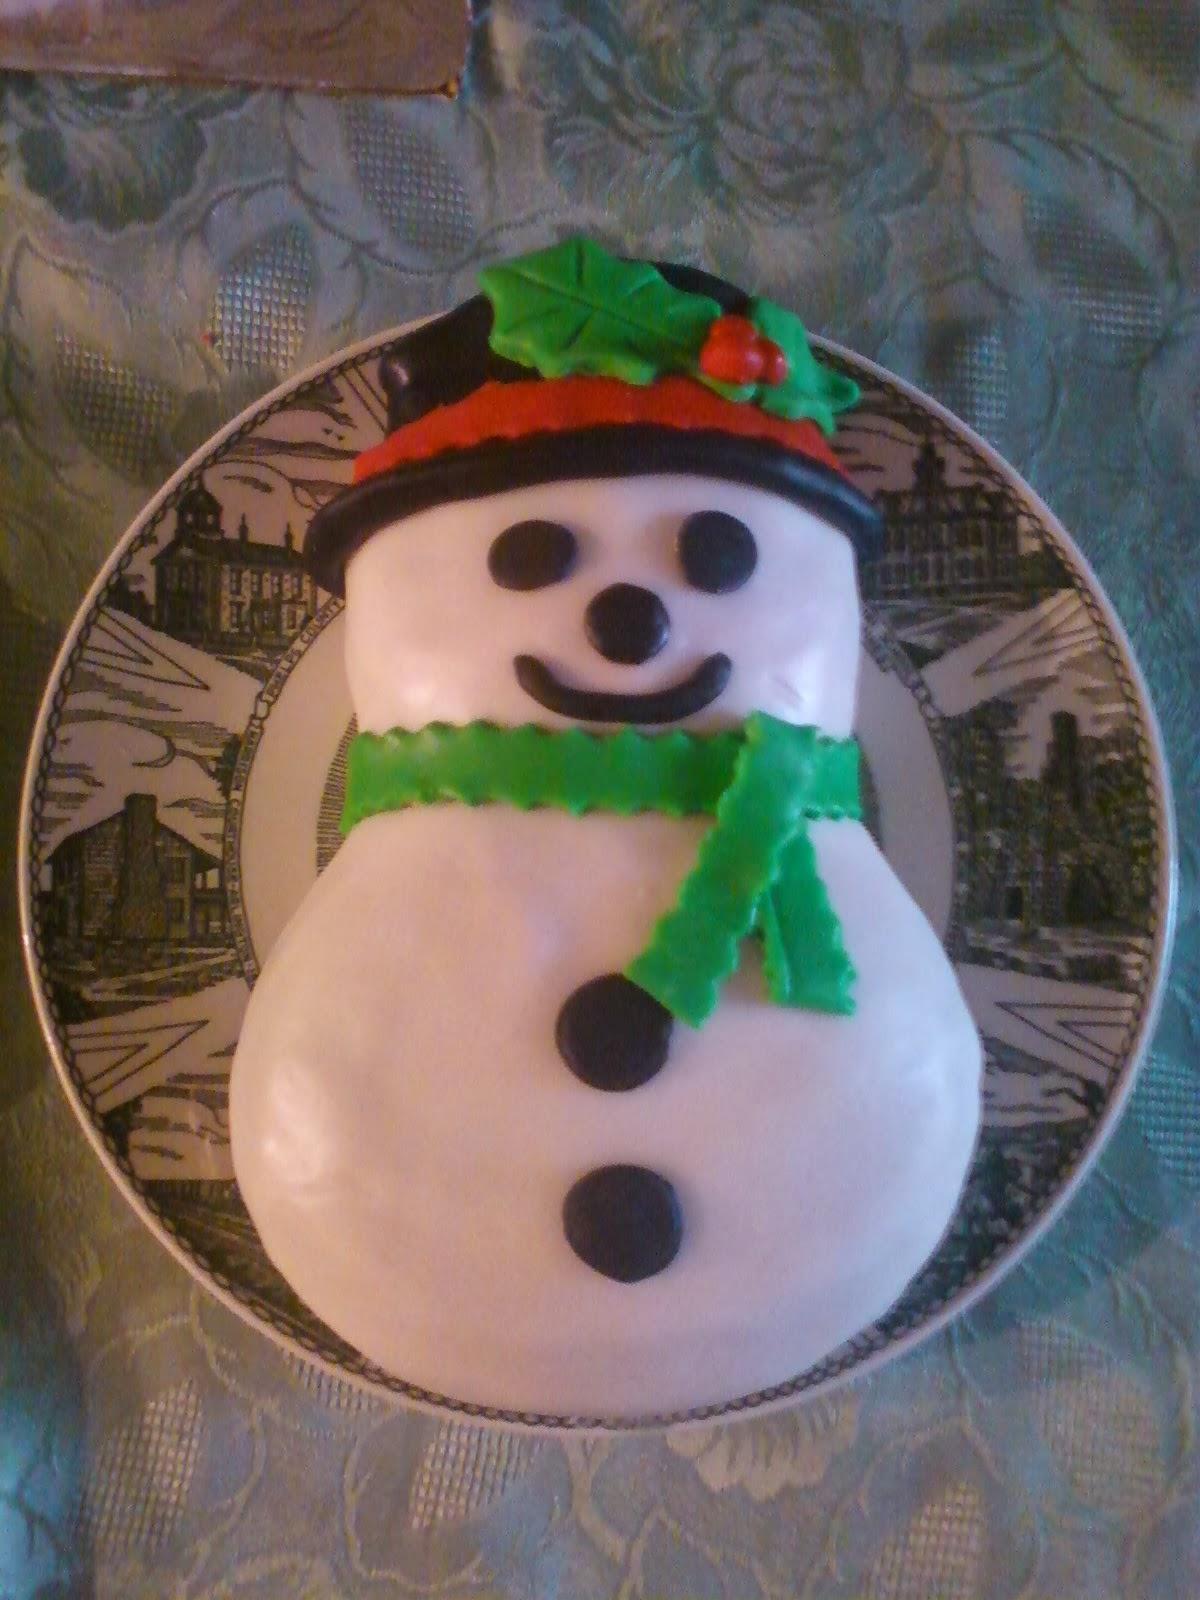 Salleeb S Kitchen Christmas Mini Cake Magic Frosty The